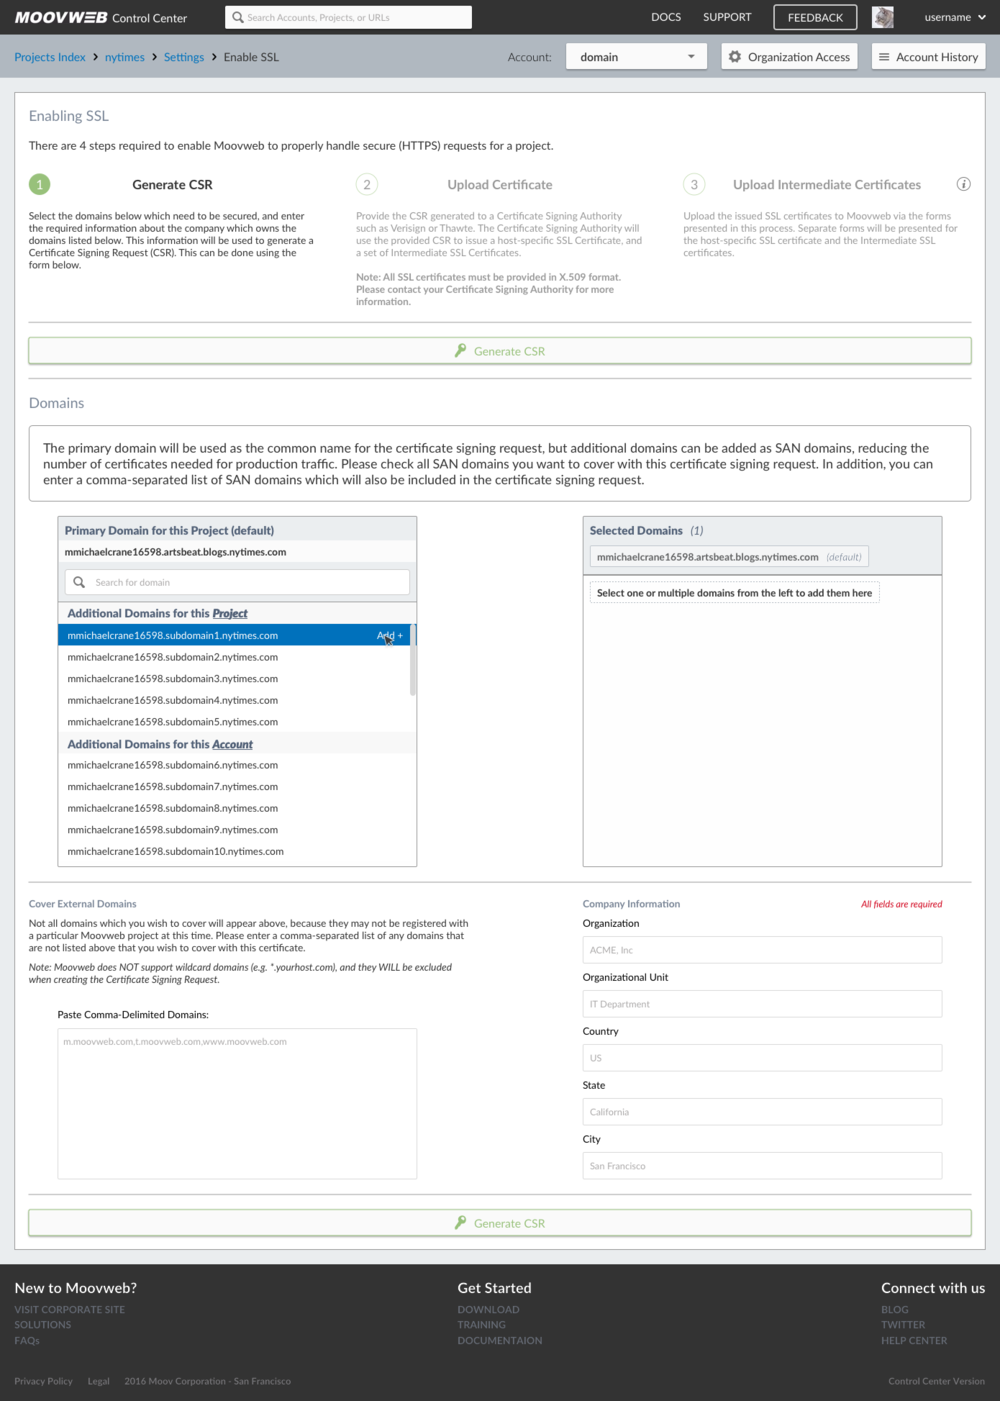 Generate CSR - Domain - Hover